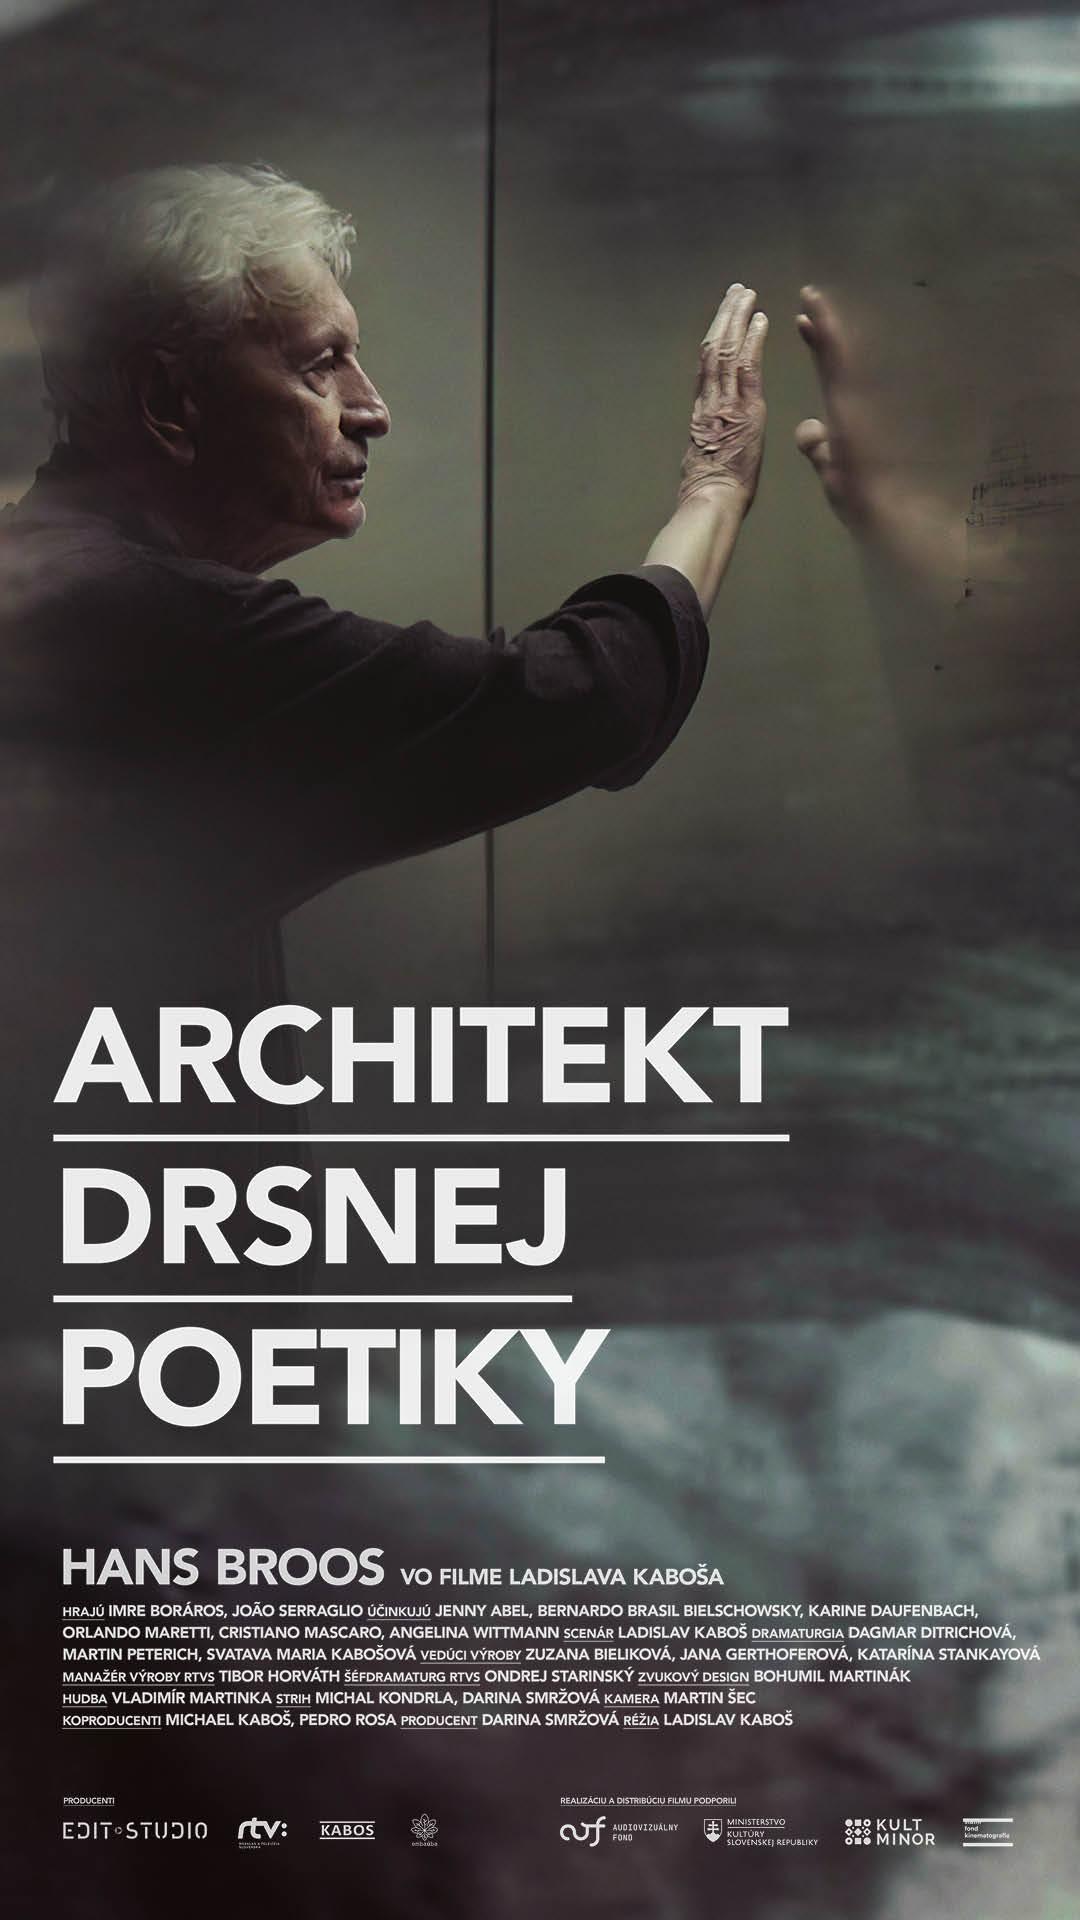 Architekt drsnej poetiky